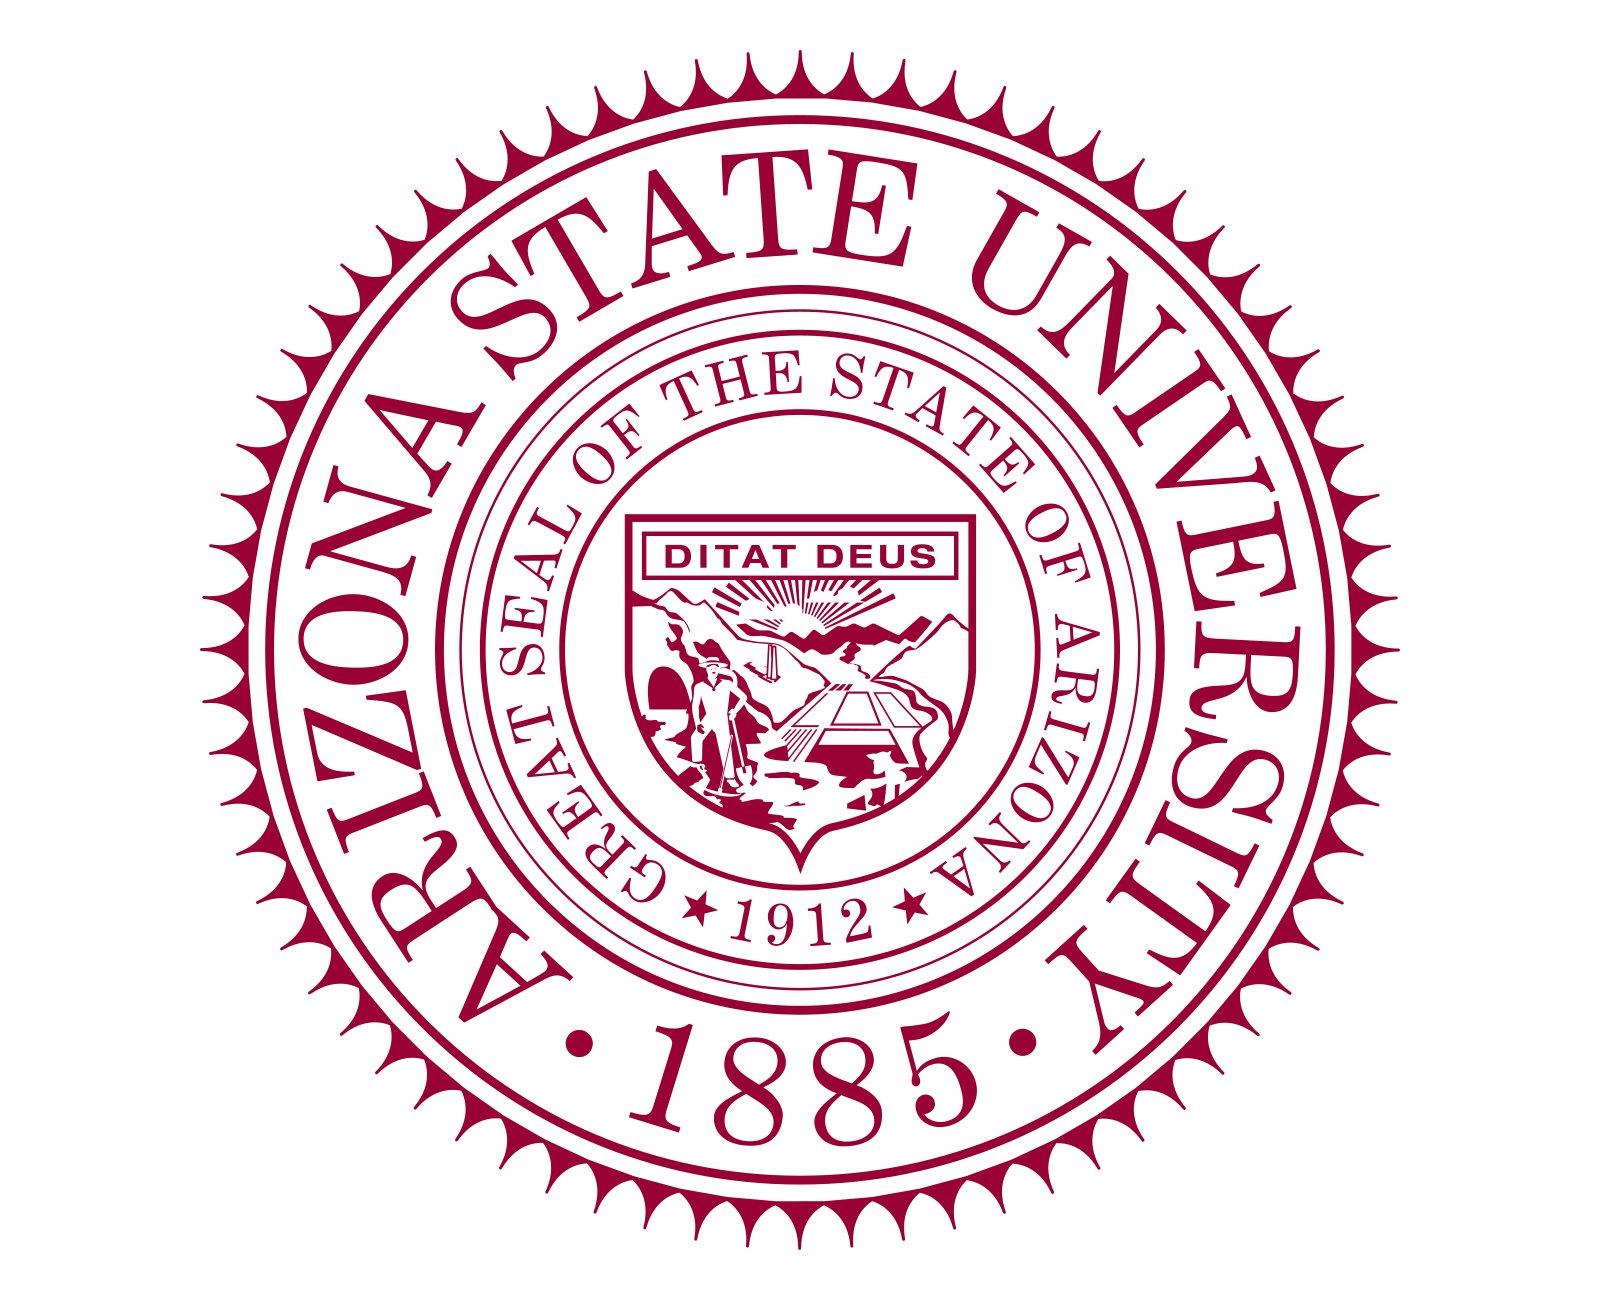 Arizona Meaning logo State  | and symbol University history